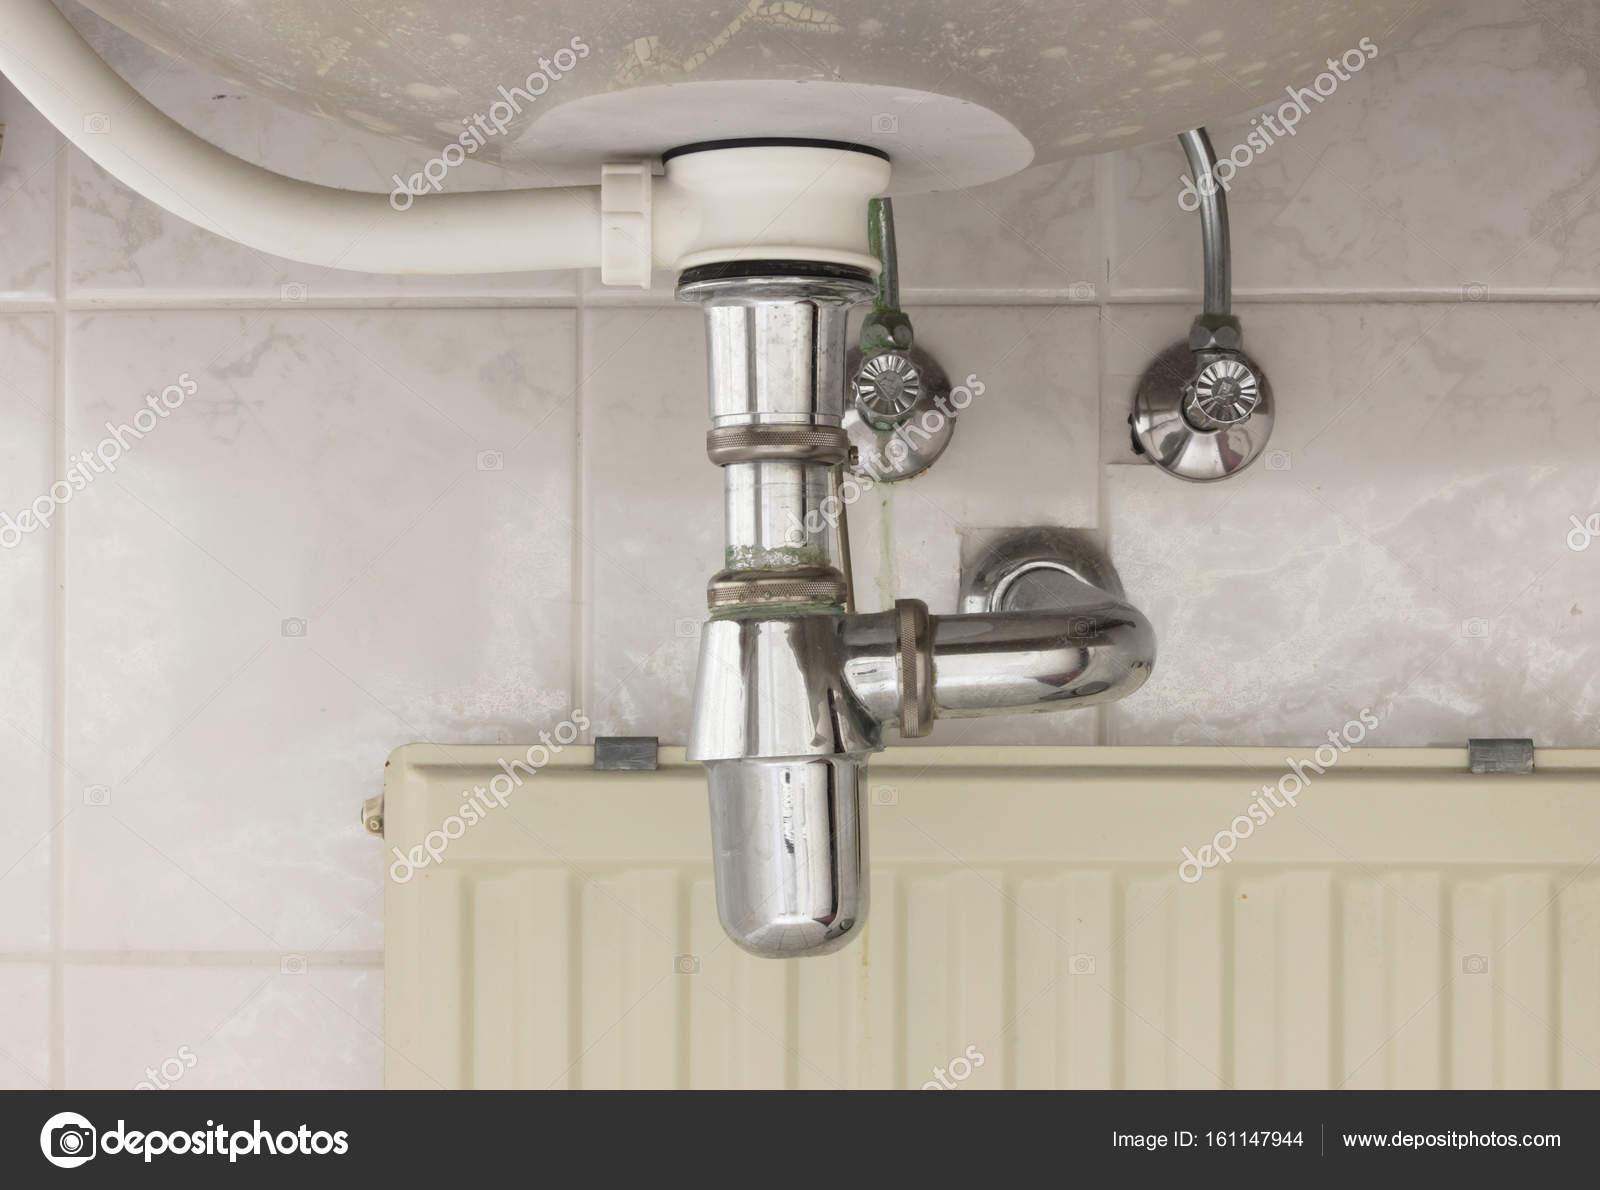 Becken Siphon oder Waschbecken Abfluss im Badezimmer — Stockfoto ...